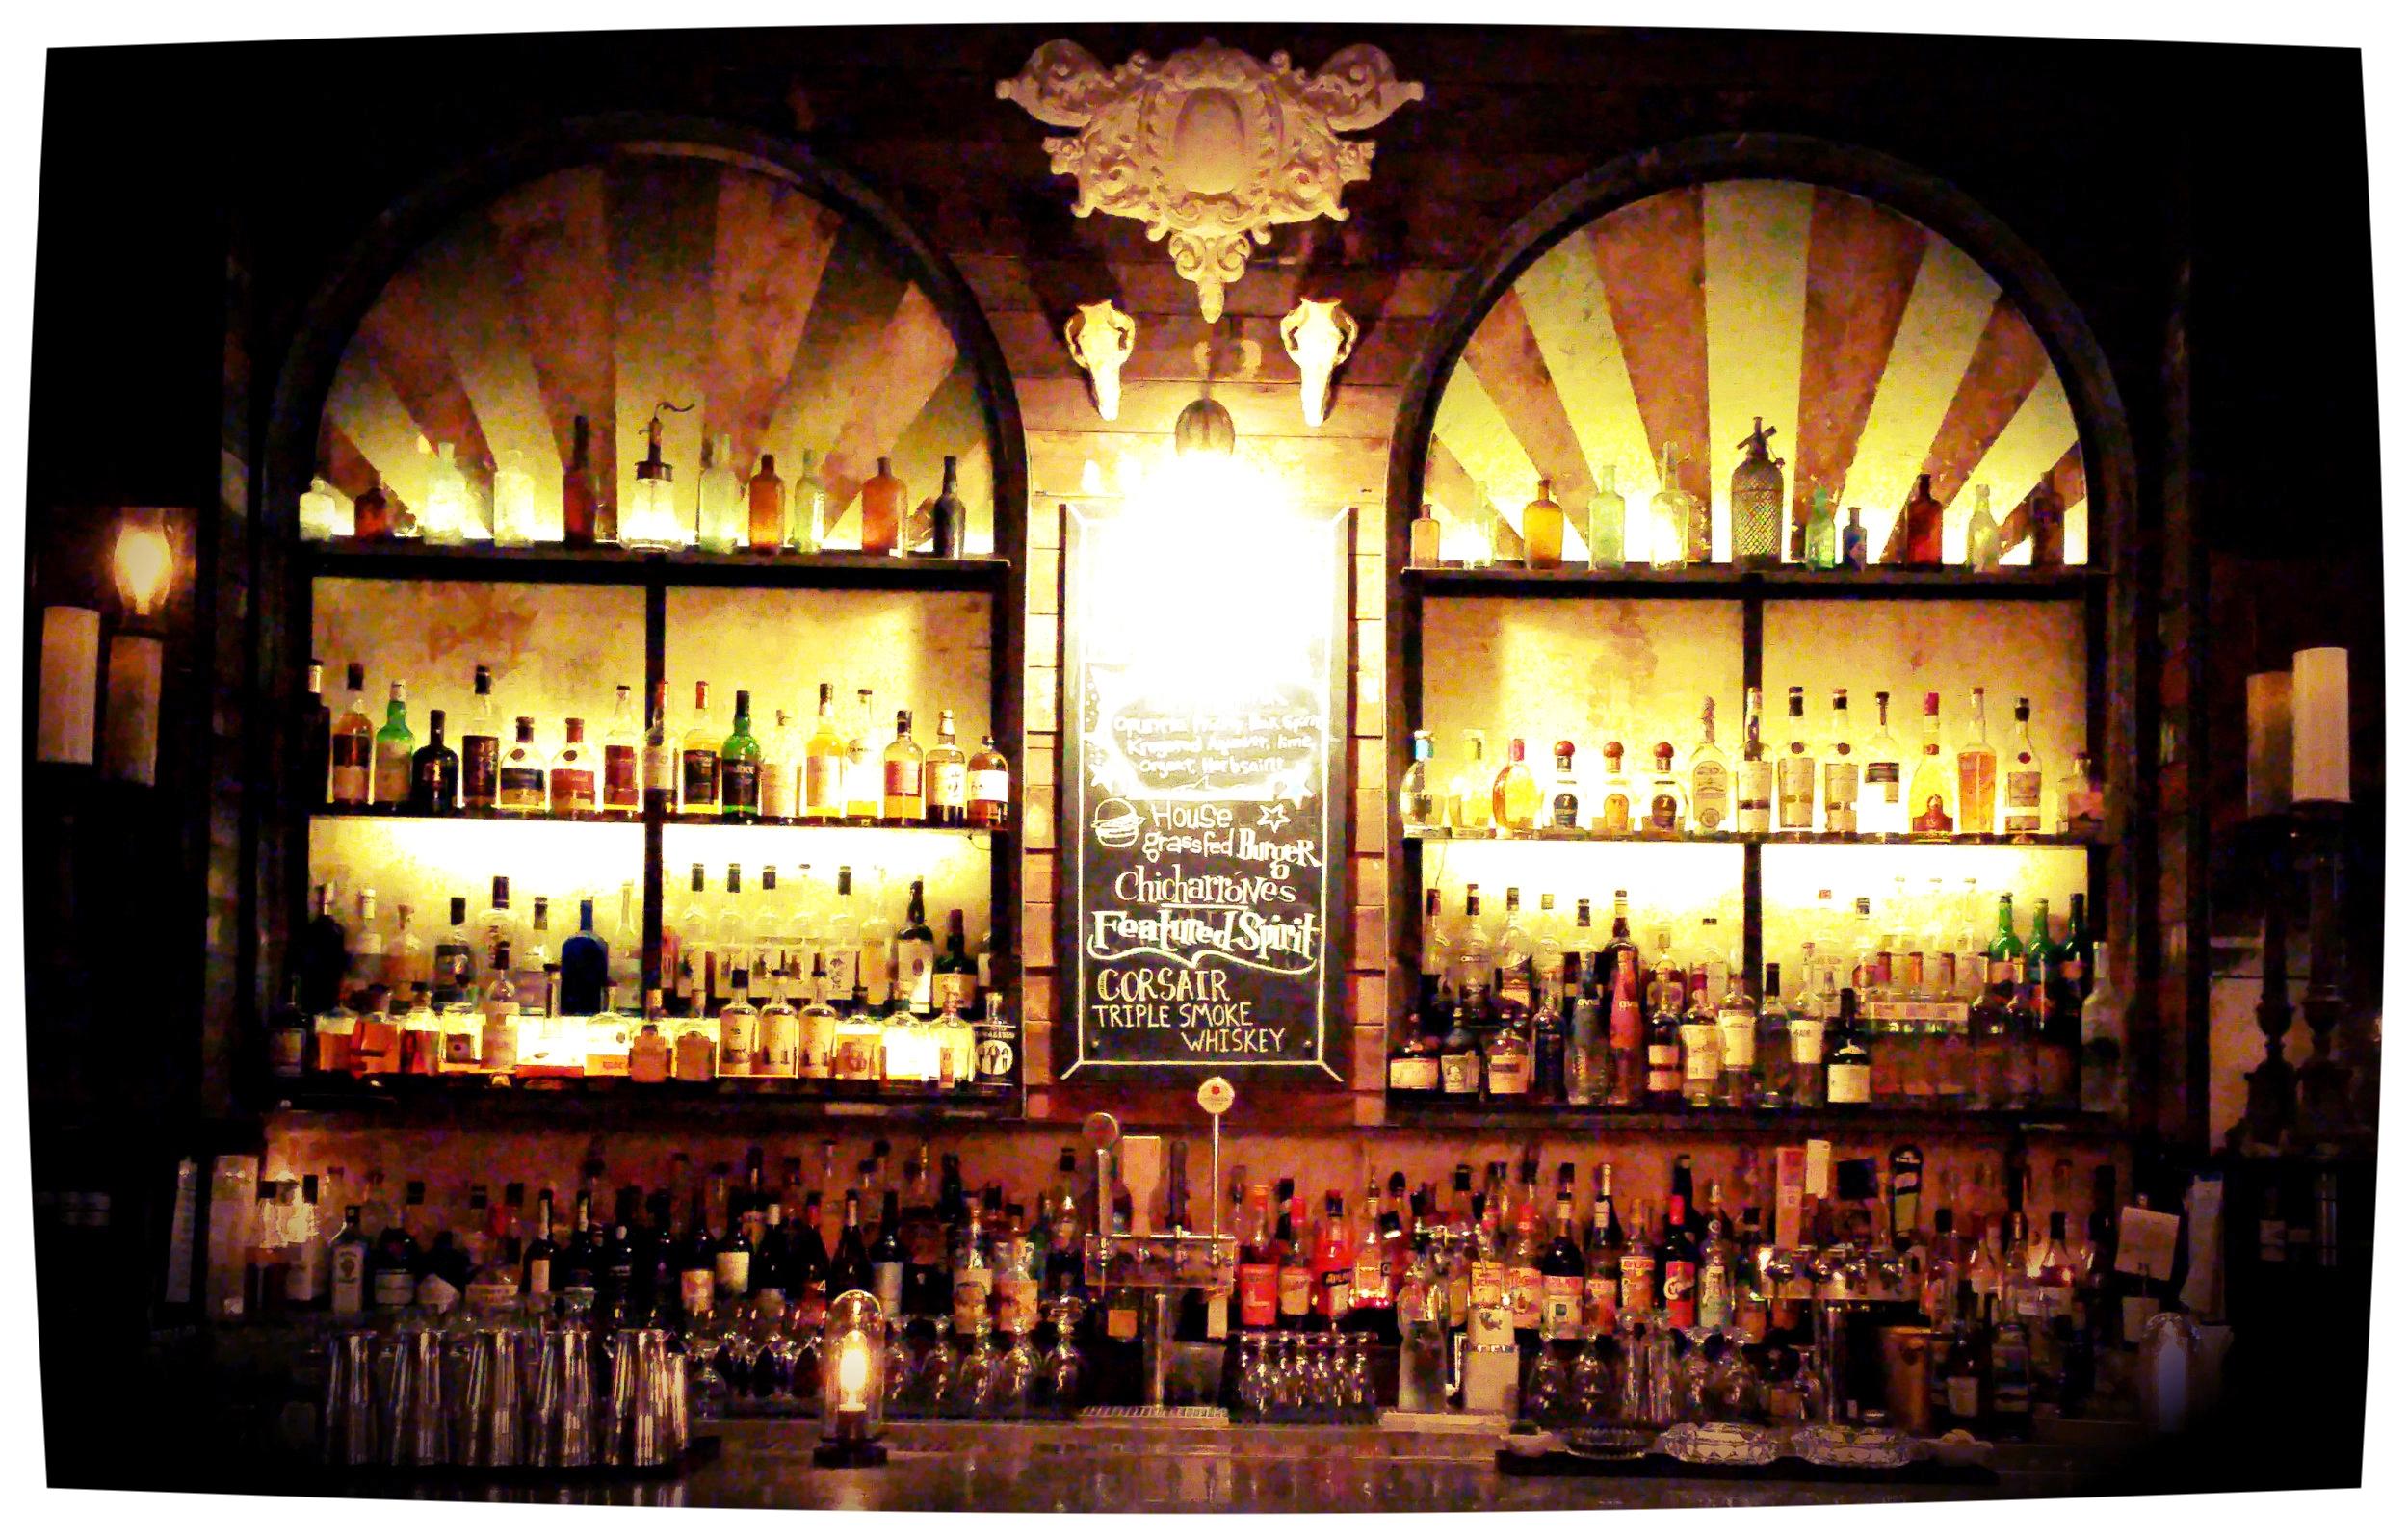 Bar Kitchen Revival Bar Kitchenrevival Bar Kitchen